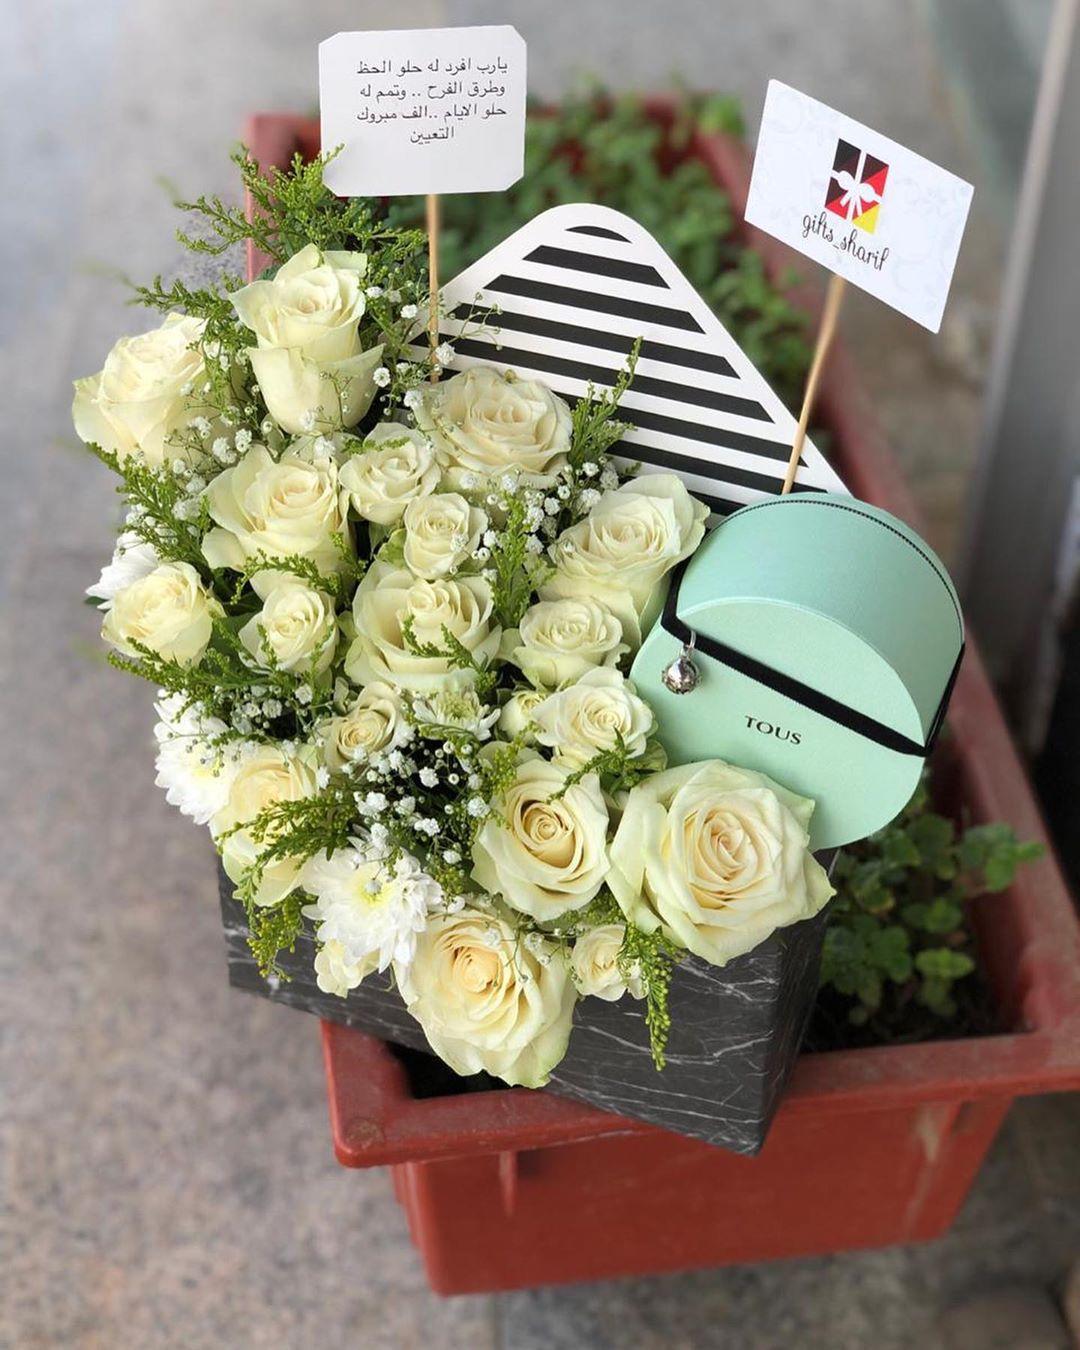 Pin By Flowerstagram On Dessin De Visage In 2021 Flower Shop Table Decorations Decor